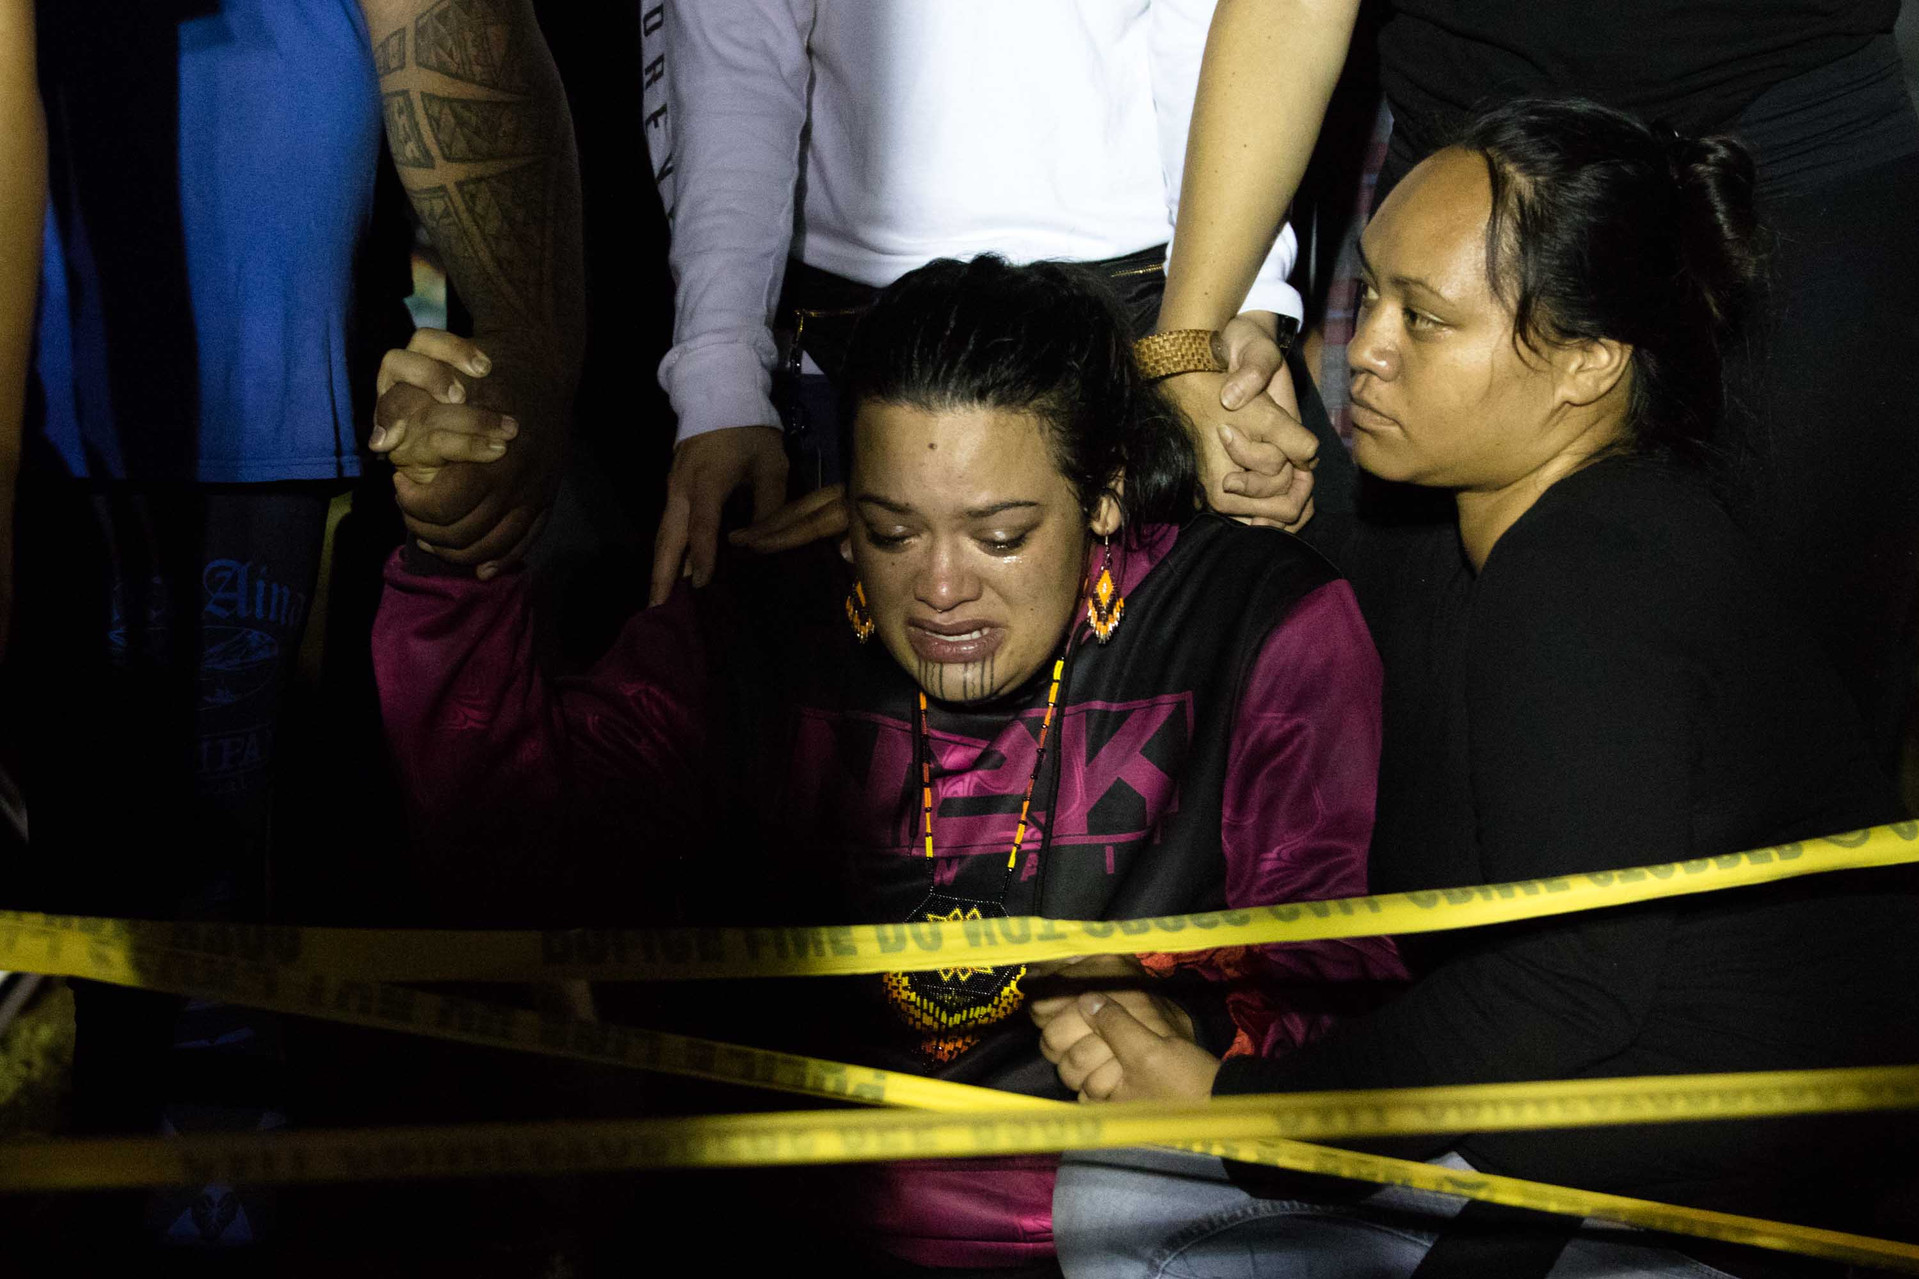 Wind farm protestor Ku'ulei Perreira-Keawekane gets emotional over the wind farm project arrests in Kalaeloa on November 19, 2019